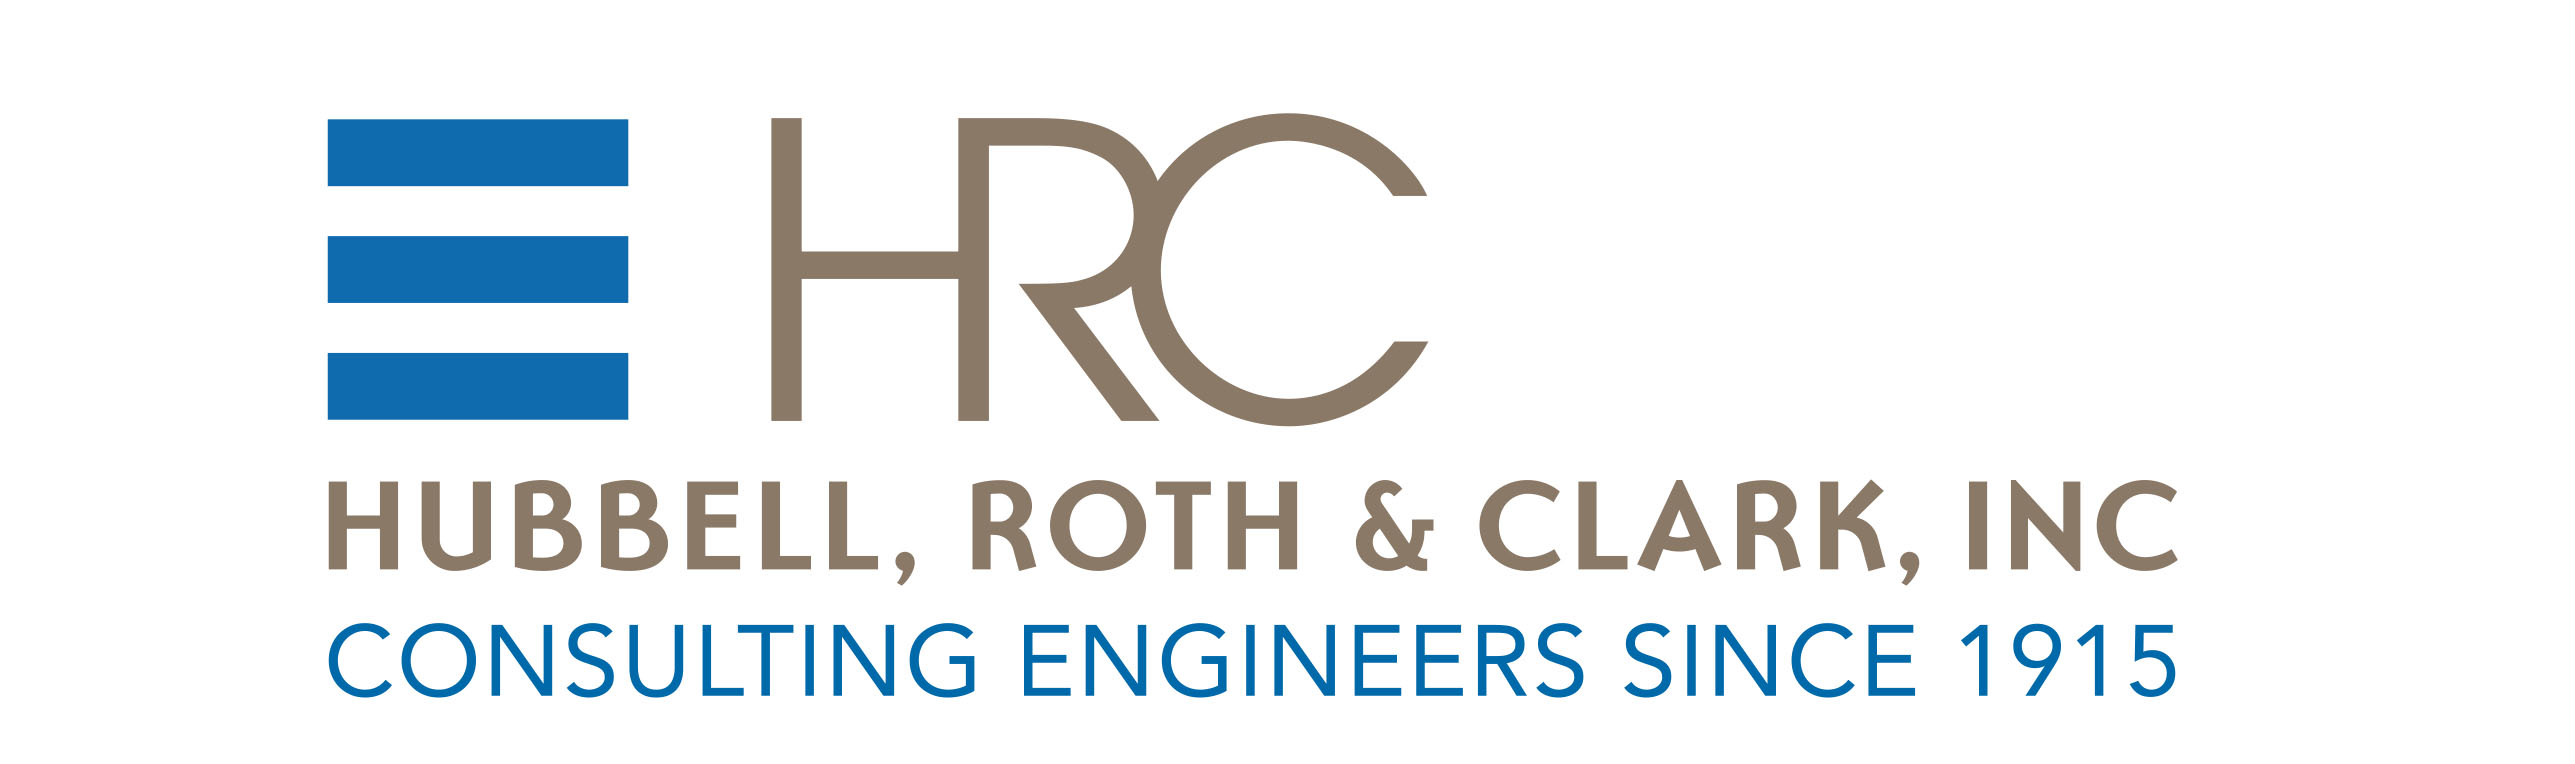 2016_HRC_logo_rgb_UPD